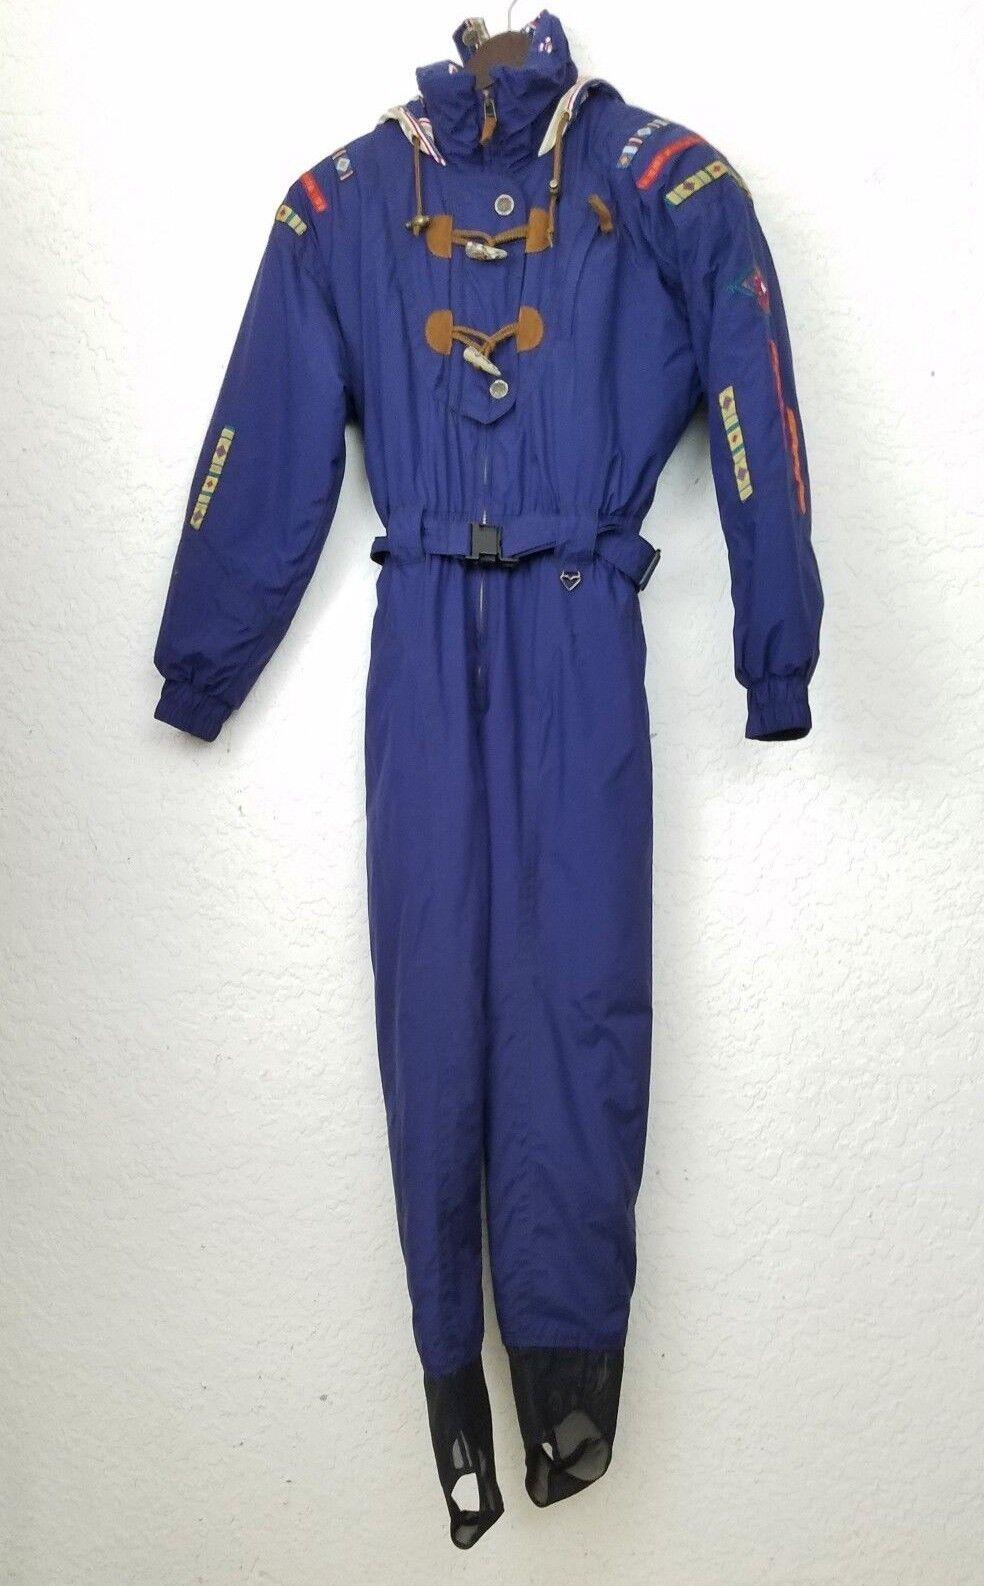 Obermeyer women ski  suit size ladies 4 snowsuit bluee hood belt zip long sleeves  clients first reputation first